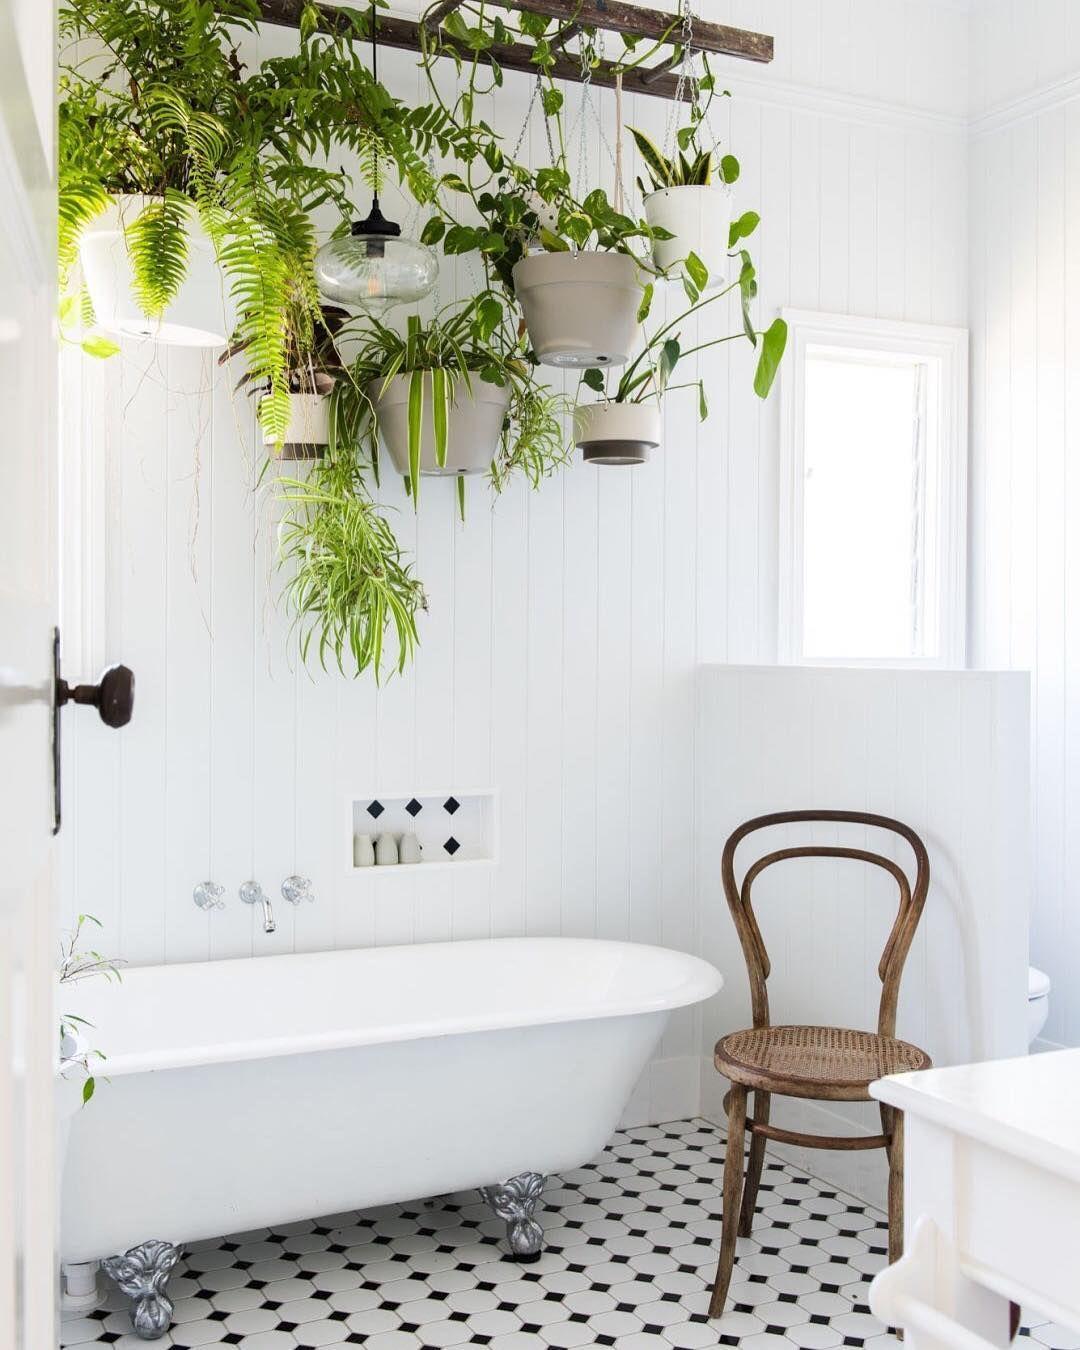 Pin di Jocelyne Andrews su House : Bathroom   Pinterest ...